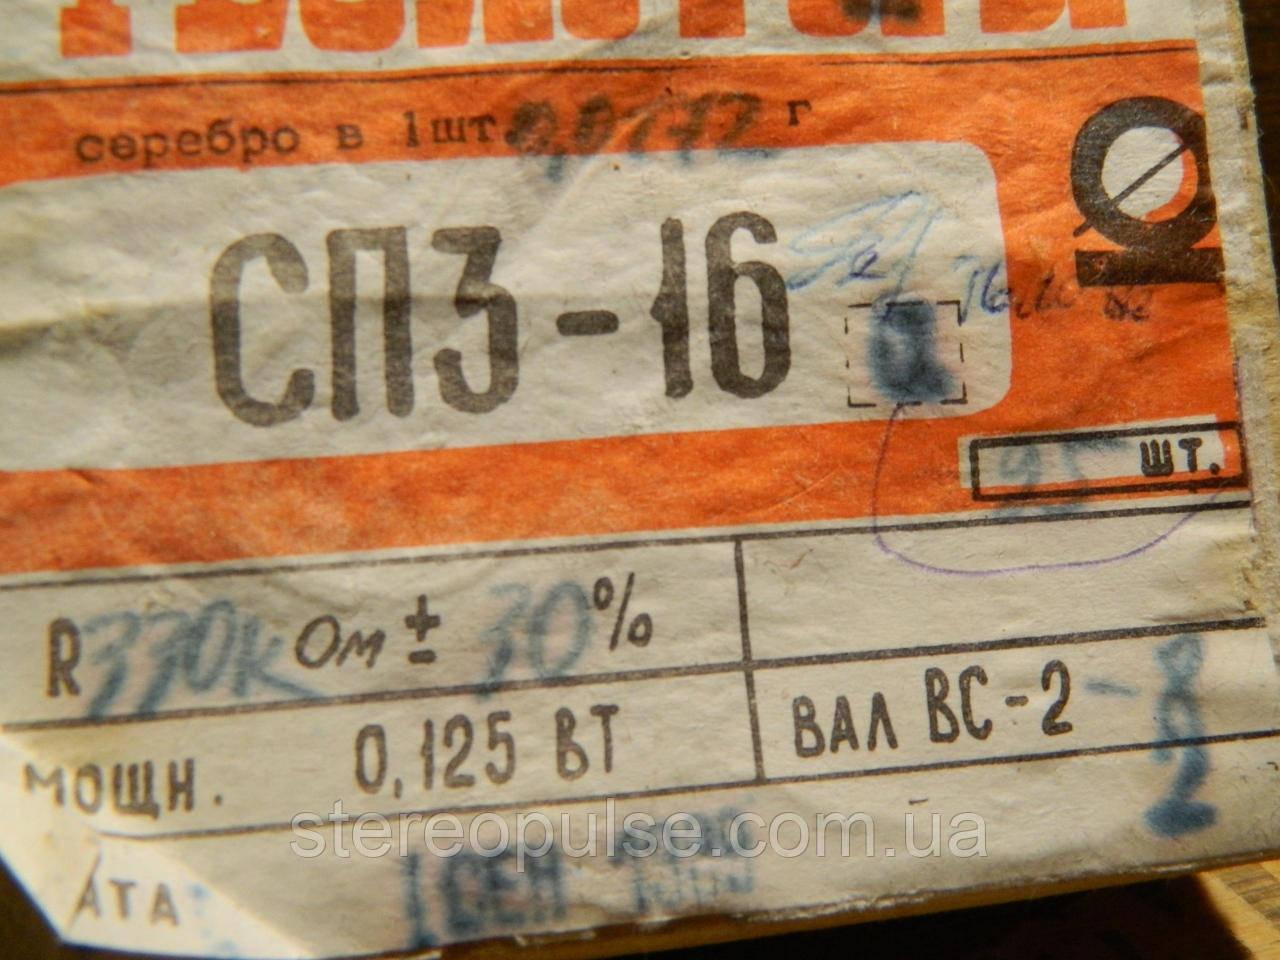 Резистор СП3 - 16А 330 кОм 0.125 вт .